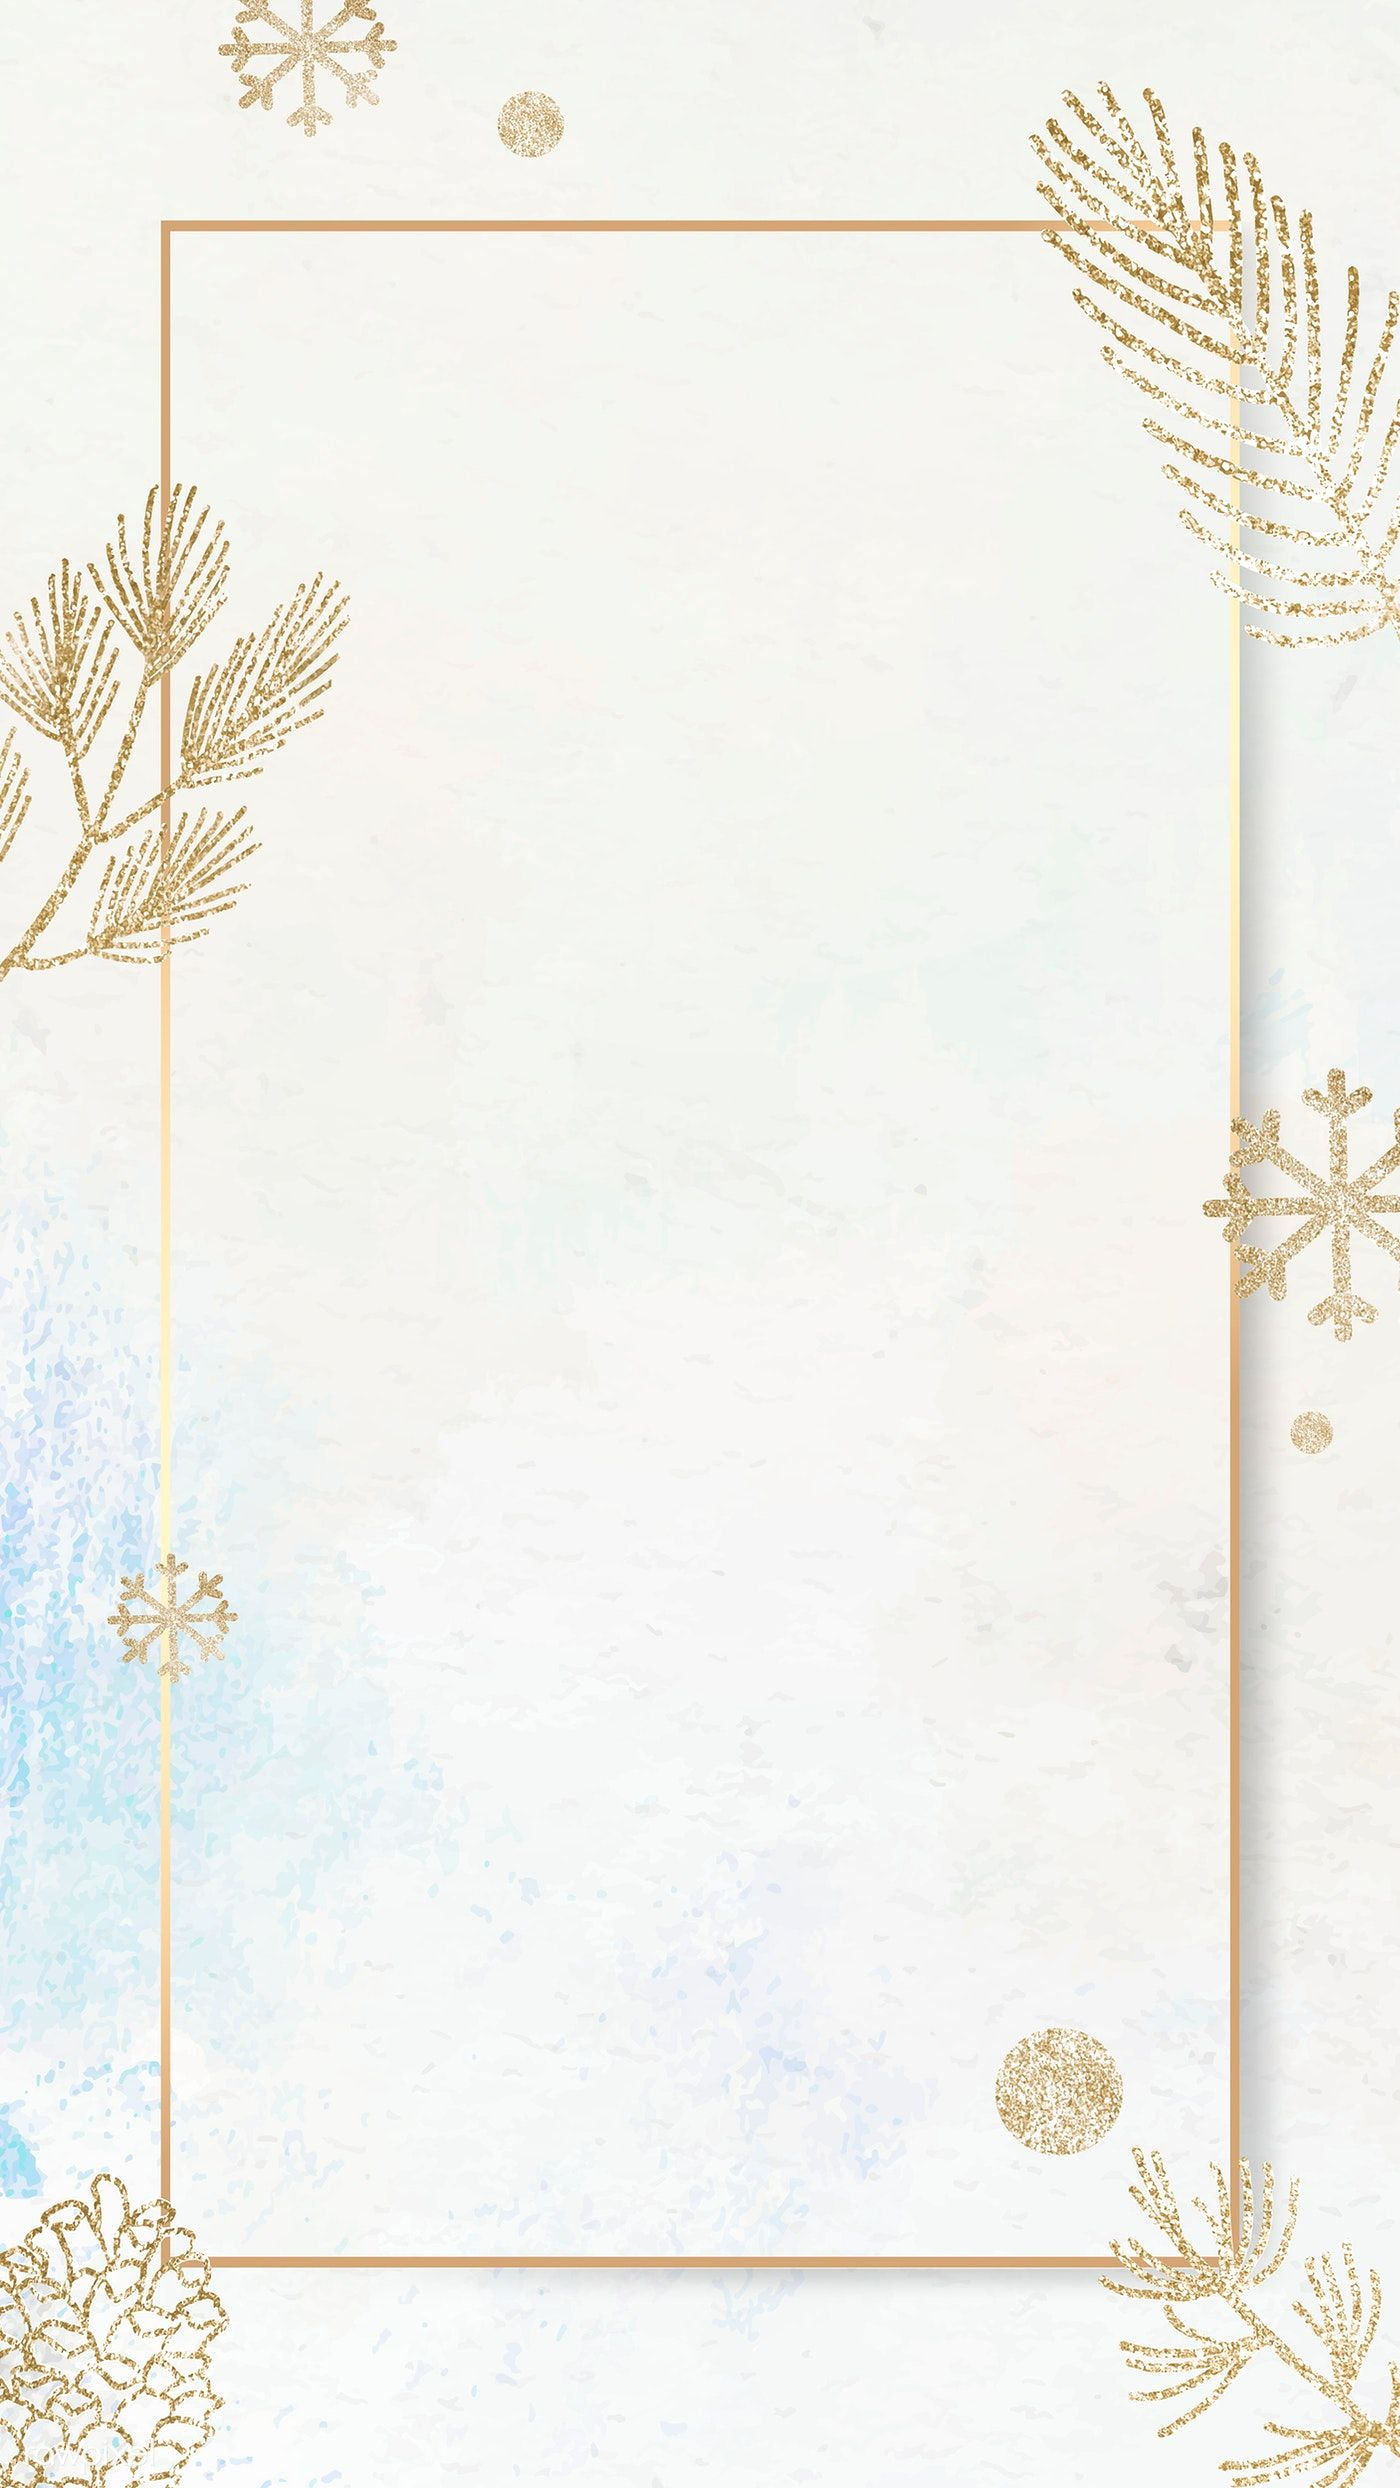 Download Premium Vector Of Shimmery Botanical Gold Frame Mobile Phone Gold Frame Framed Wallpaper Wallpaper